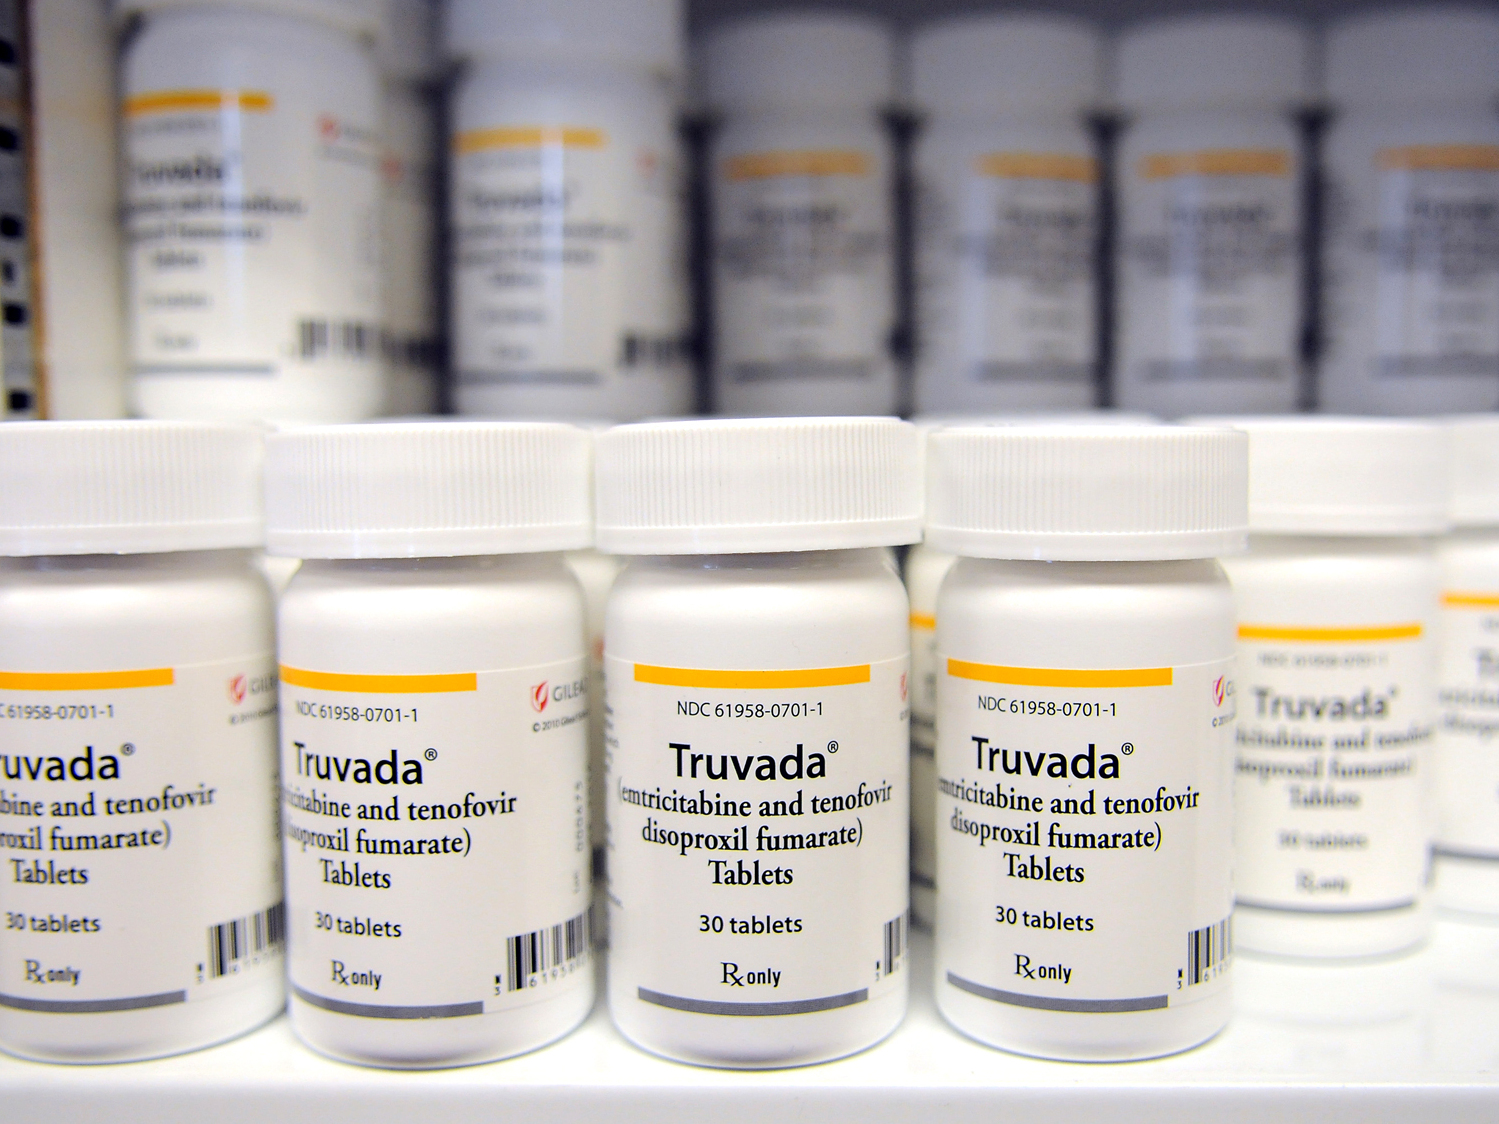 fda approved drugs 2014 pdf